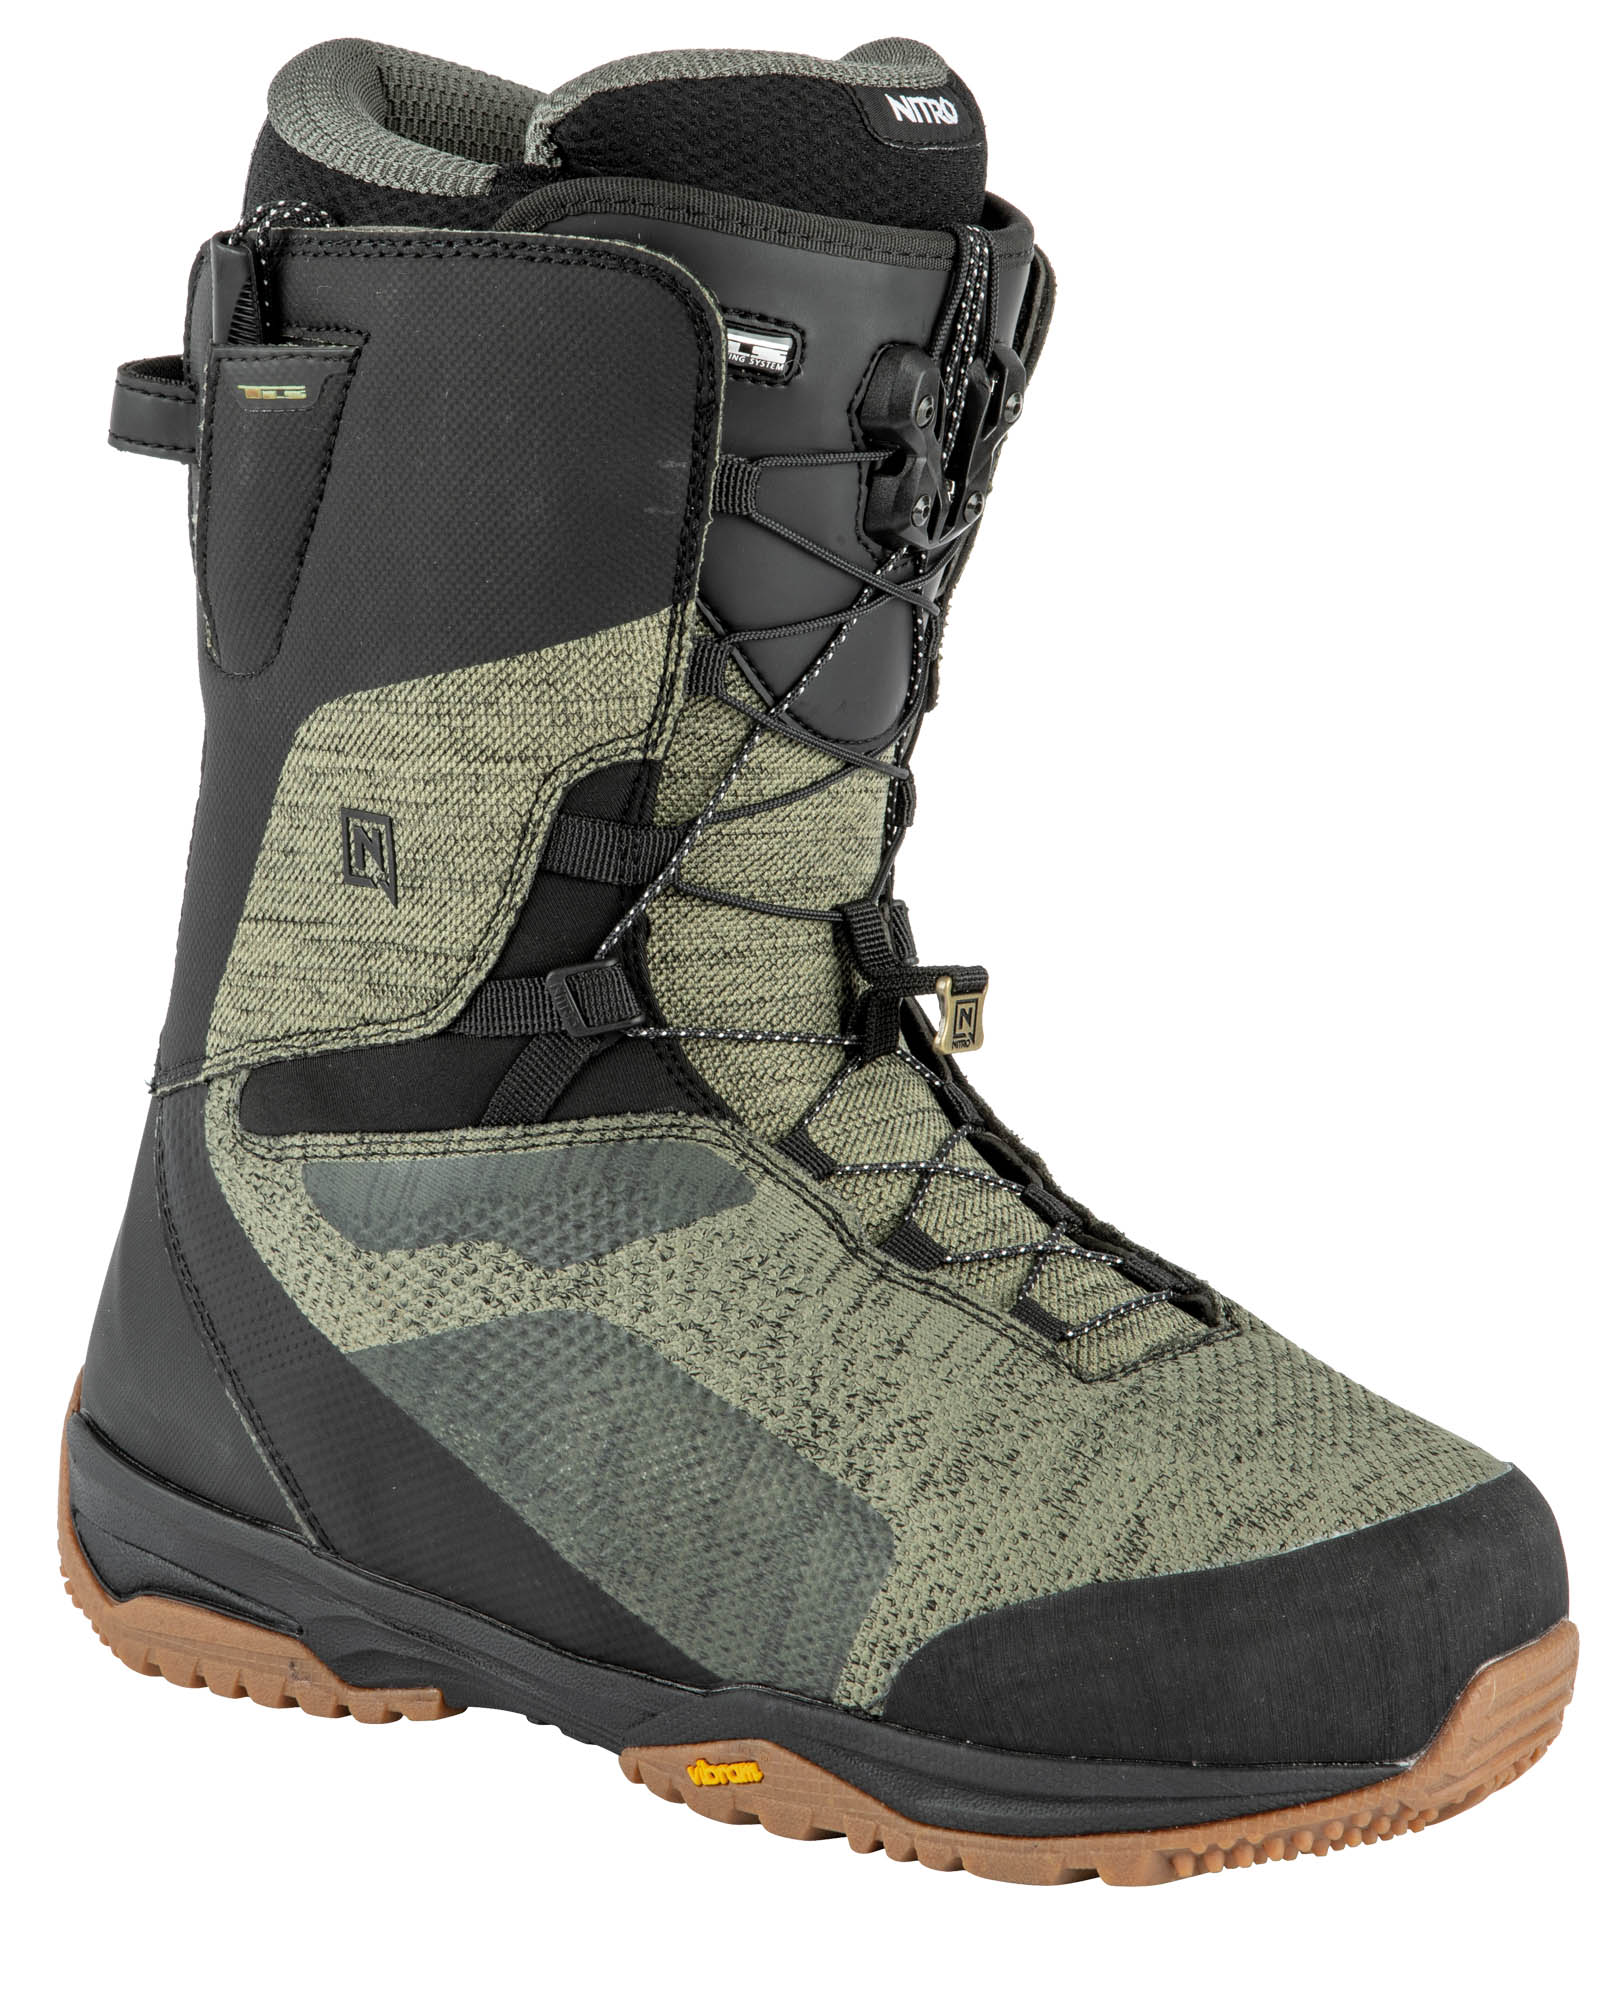 Nitro 21/22 Snowboard Boots